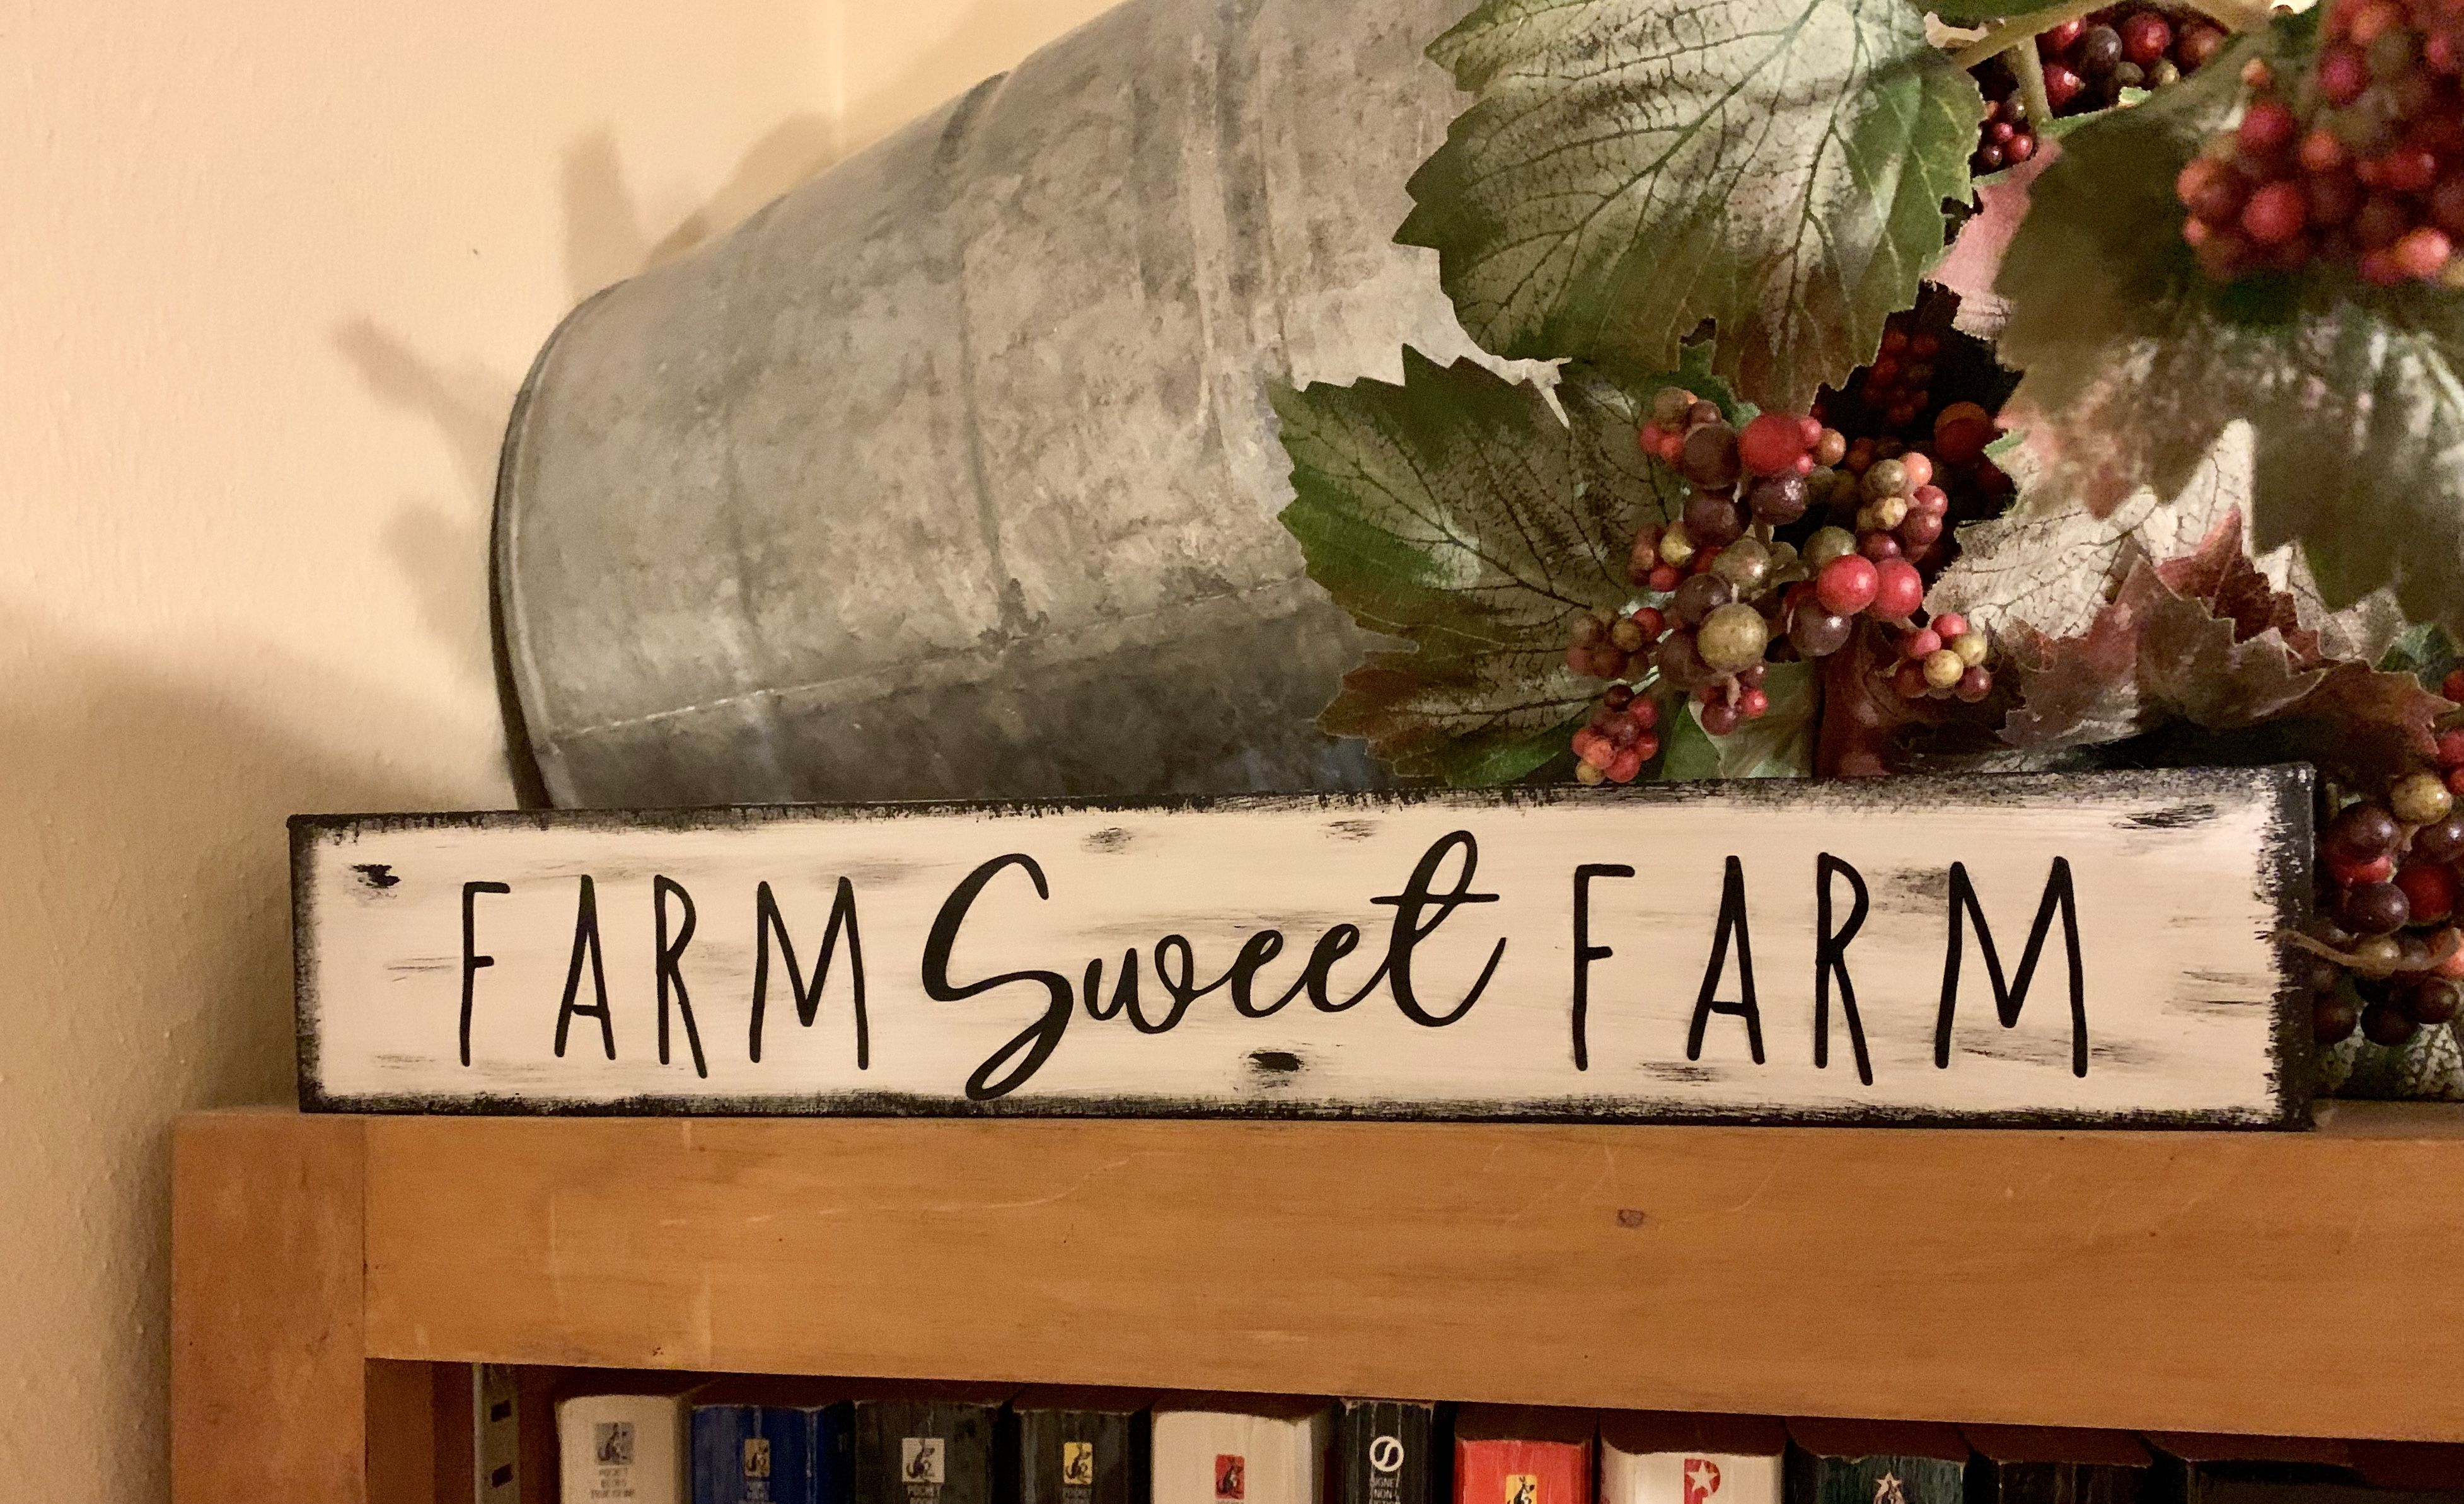 Dollar Tree Diy Farm Sweet Farm Sign Farm Signs Dollar Tree Diy Diy Signs